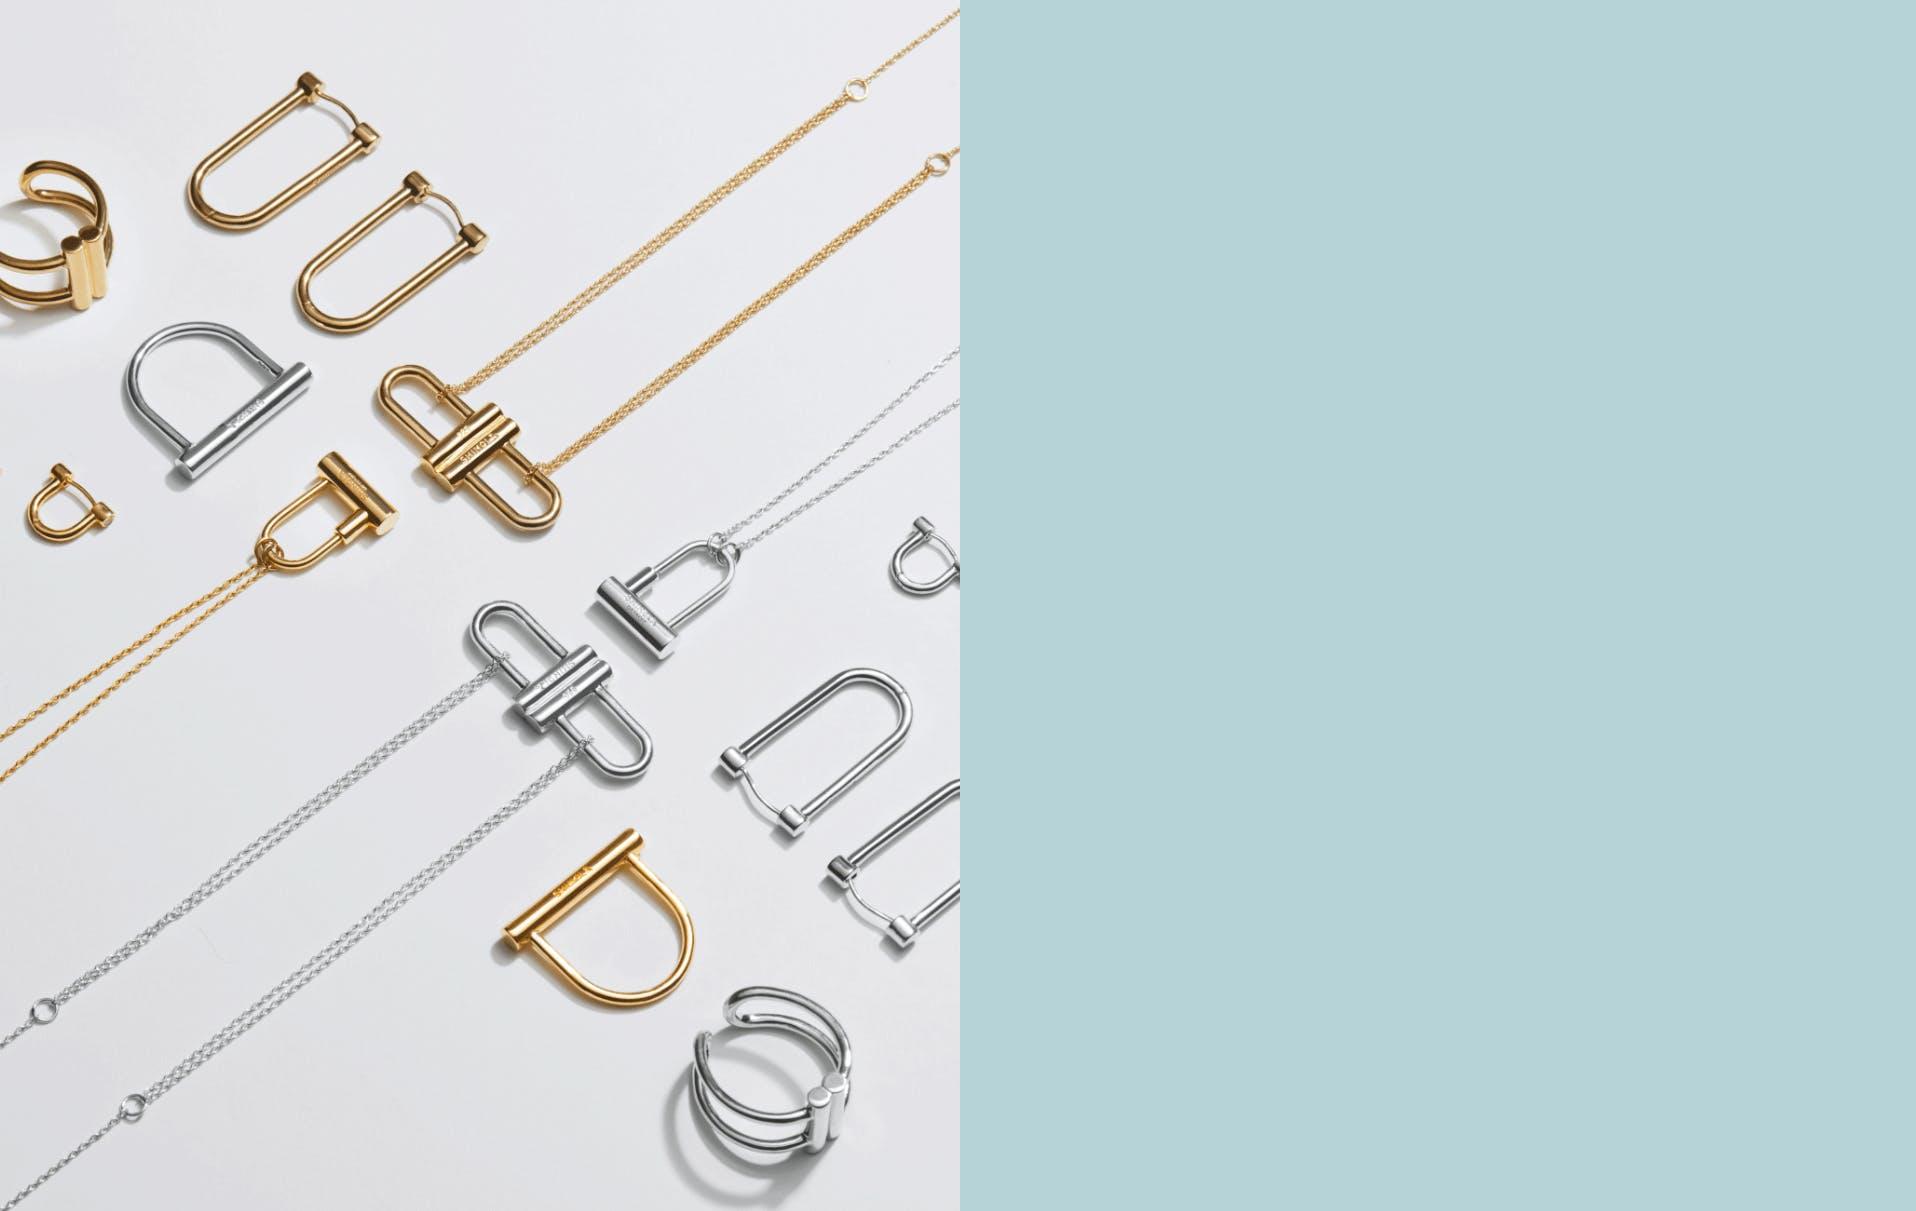 Shinola bike lock jewelry collection